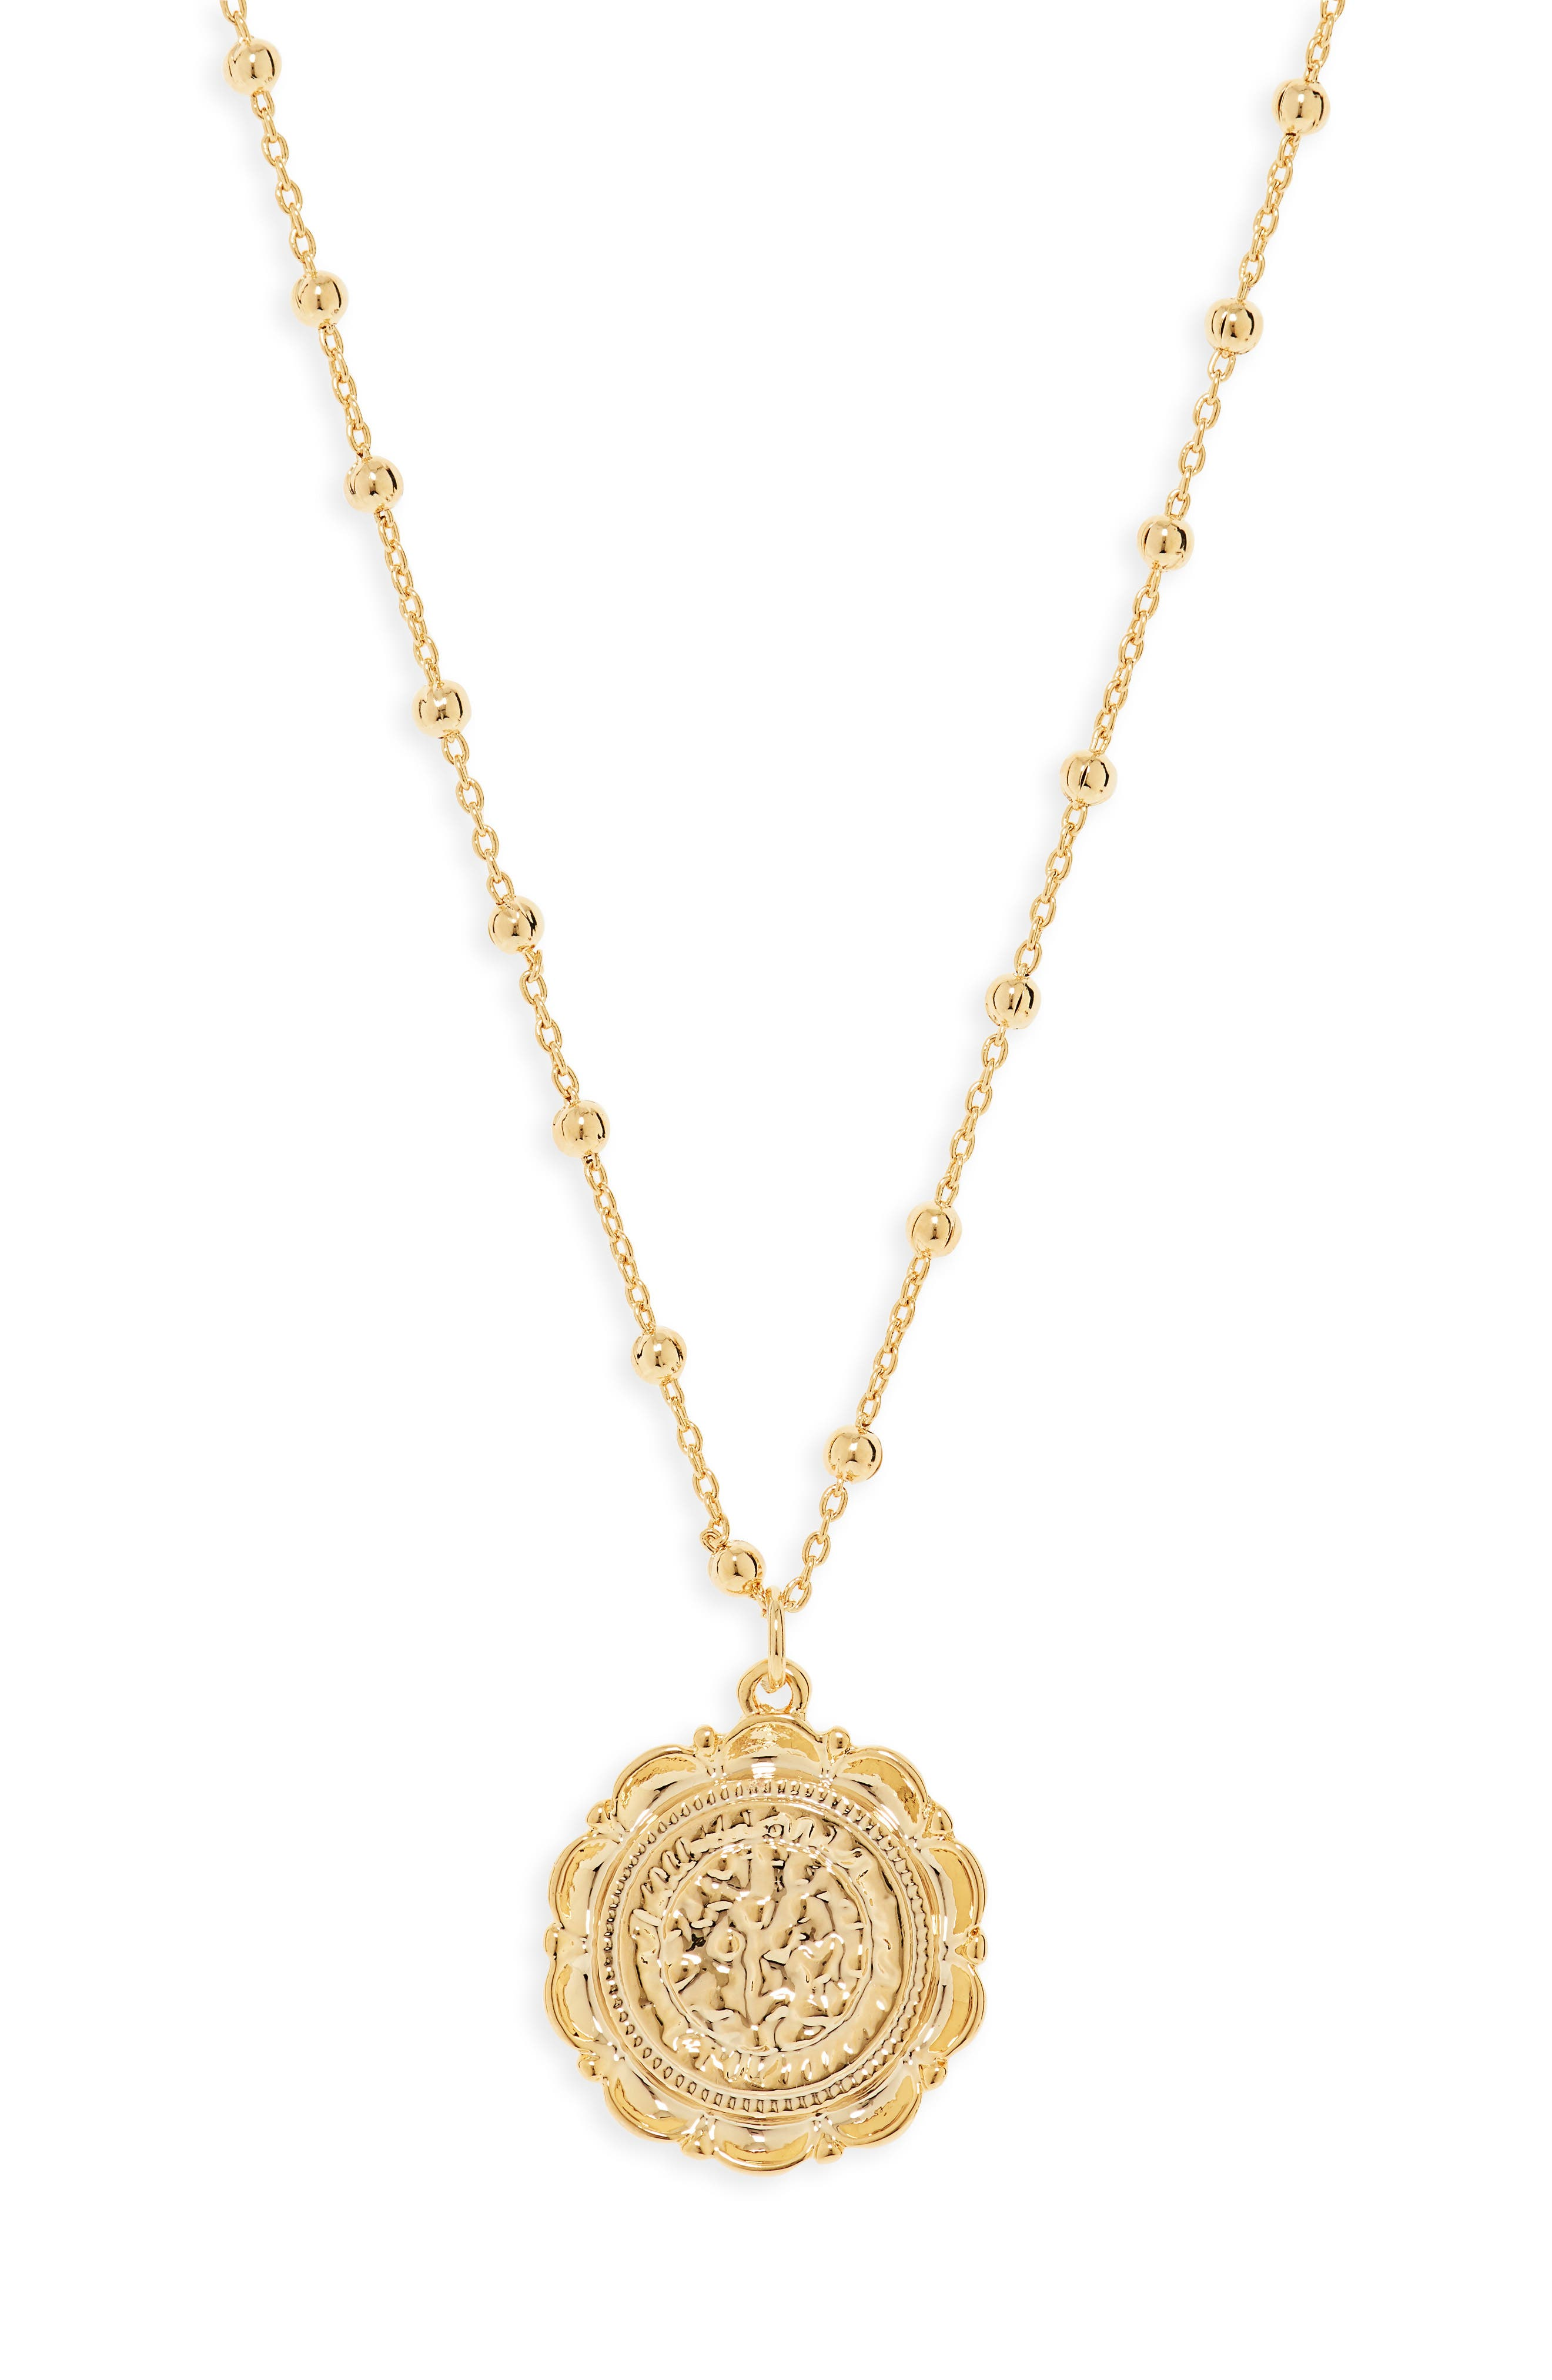 UNCOMMON JAMES BY KRISTIN CAVALLARI, Atocha Coin Necklace, Main thumbnail 1, color, GOLD